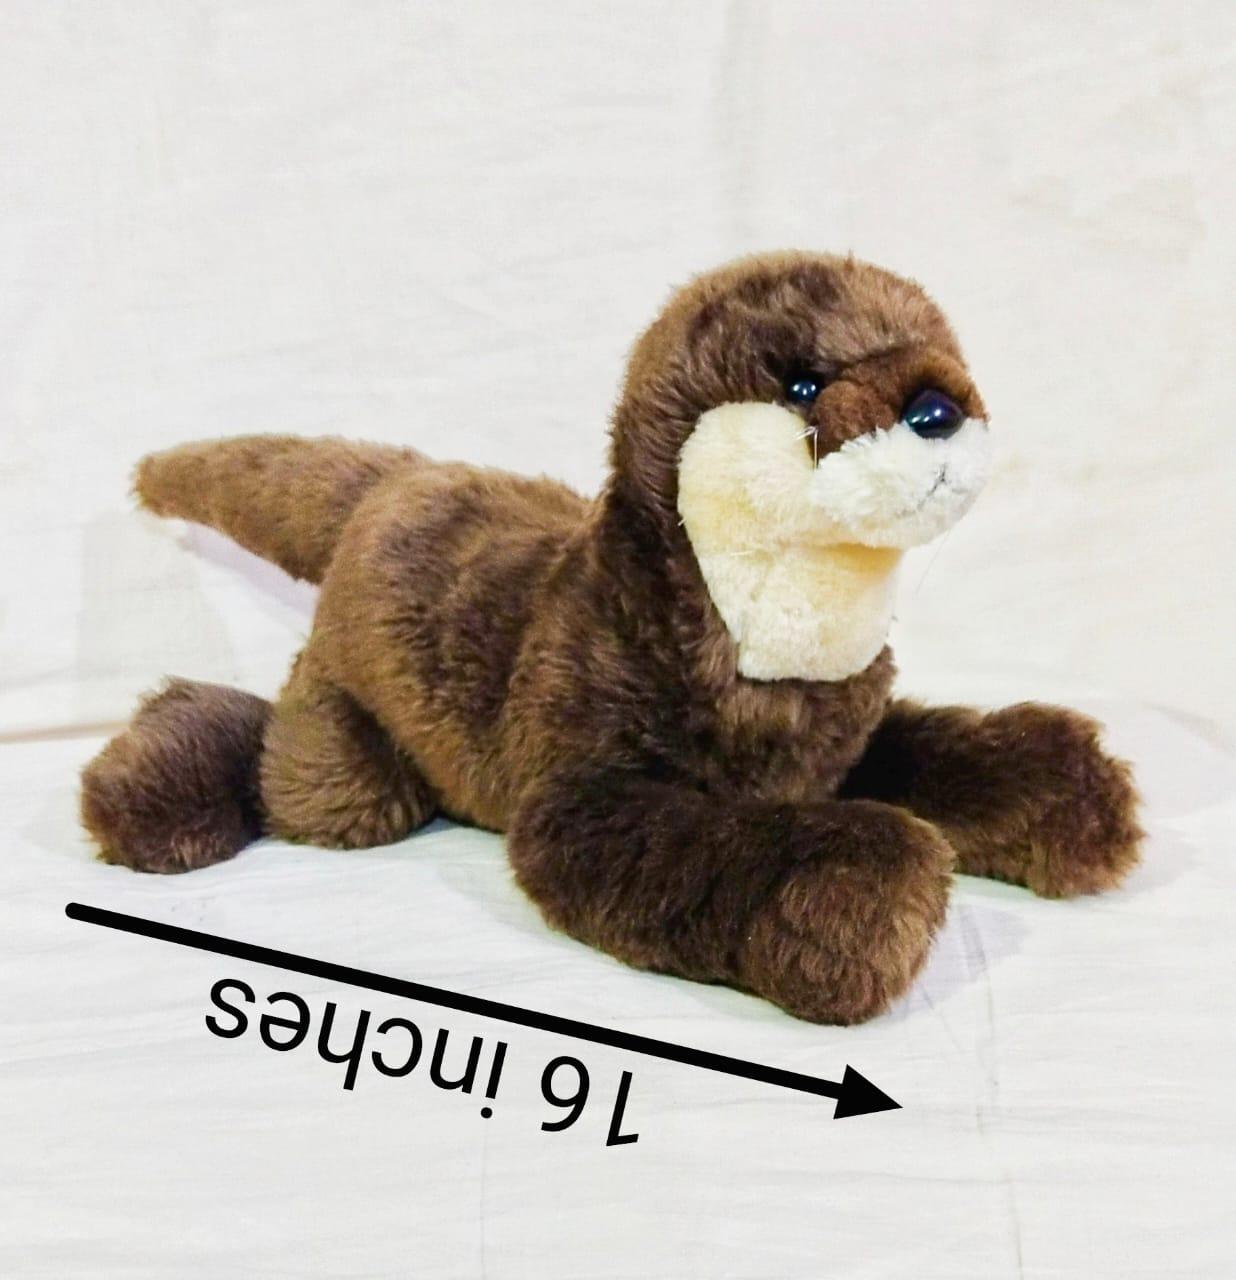 Sea Lion Plush Stuffed Toy - 16 inches